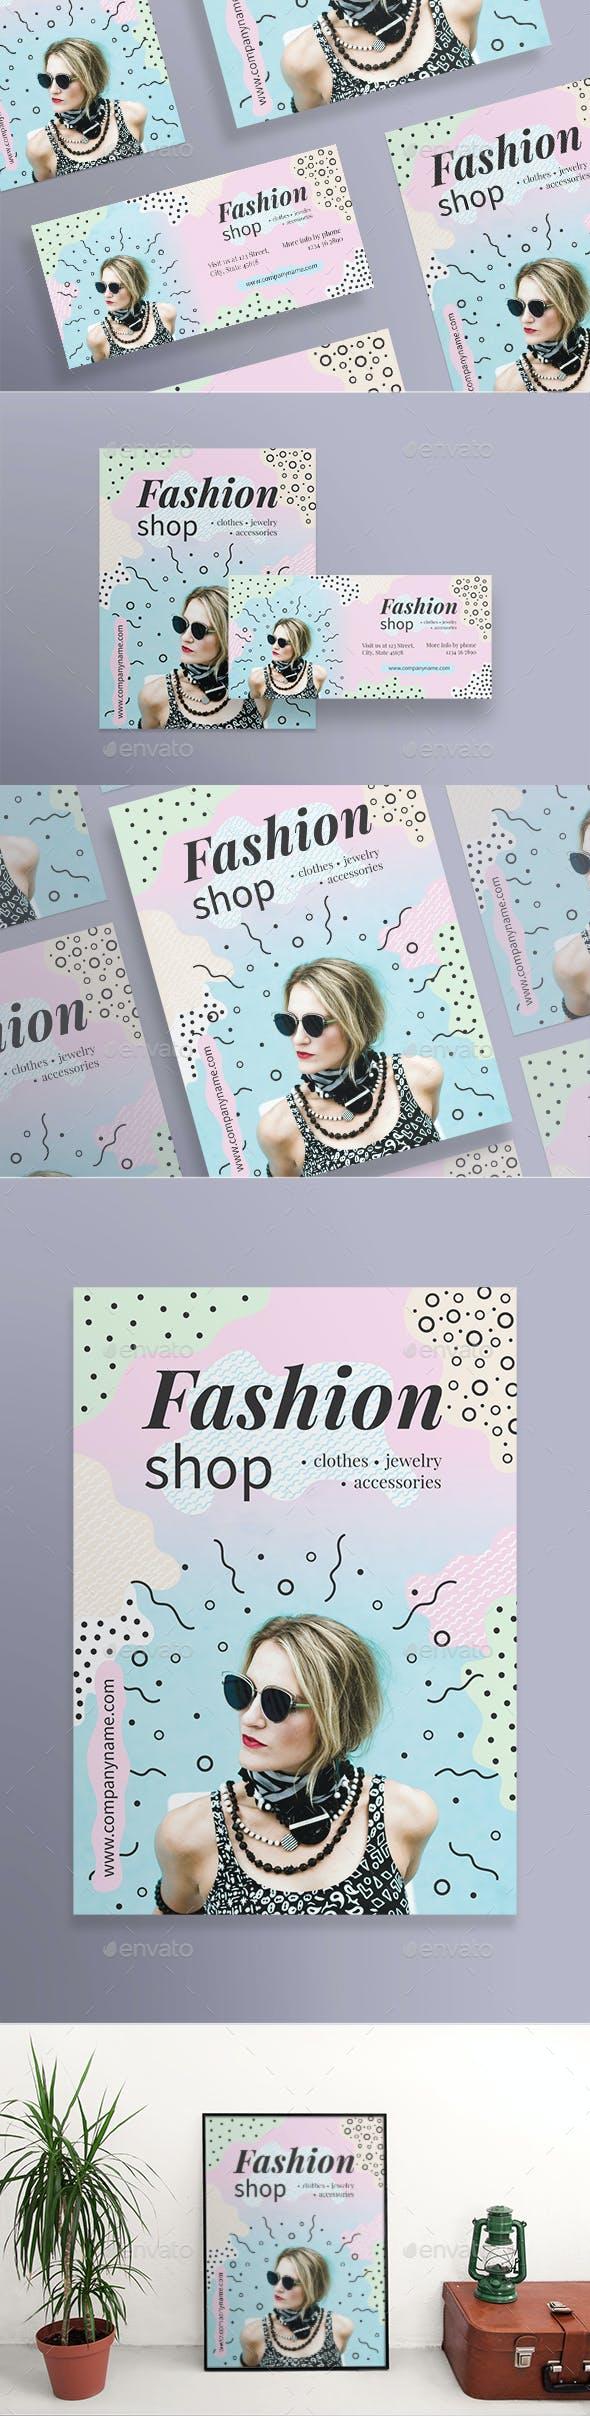 Fashion Shop Flyers